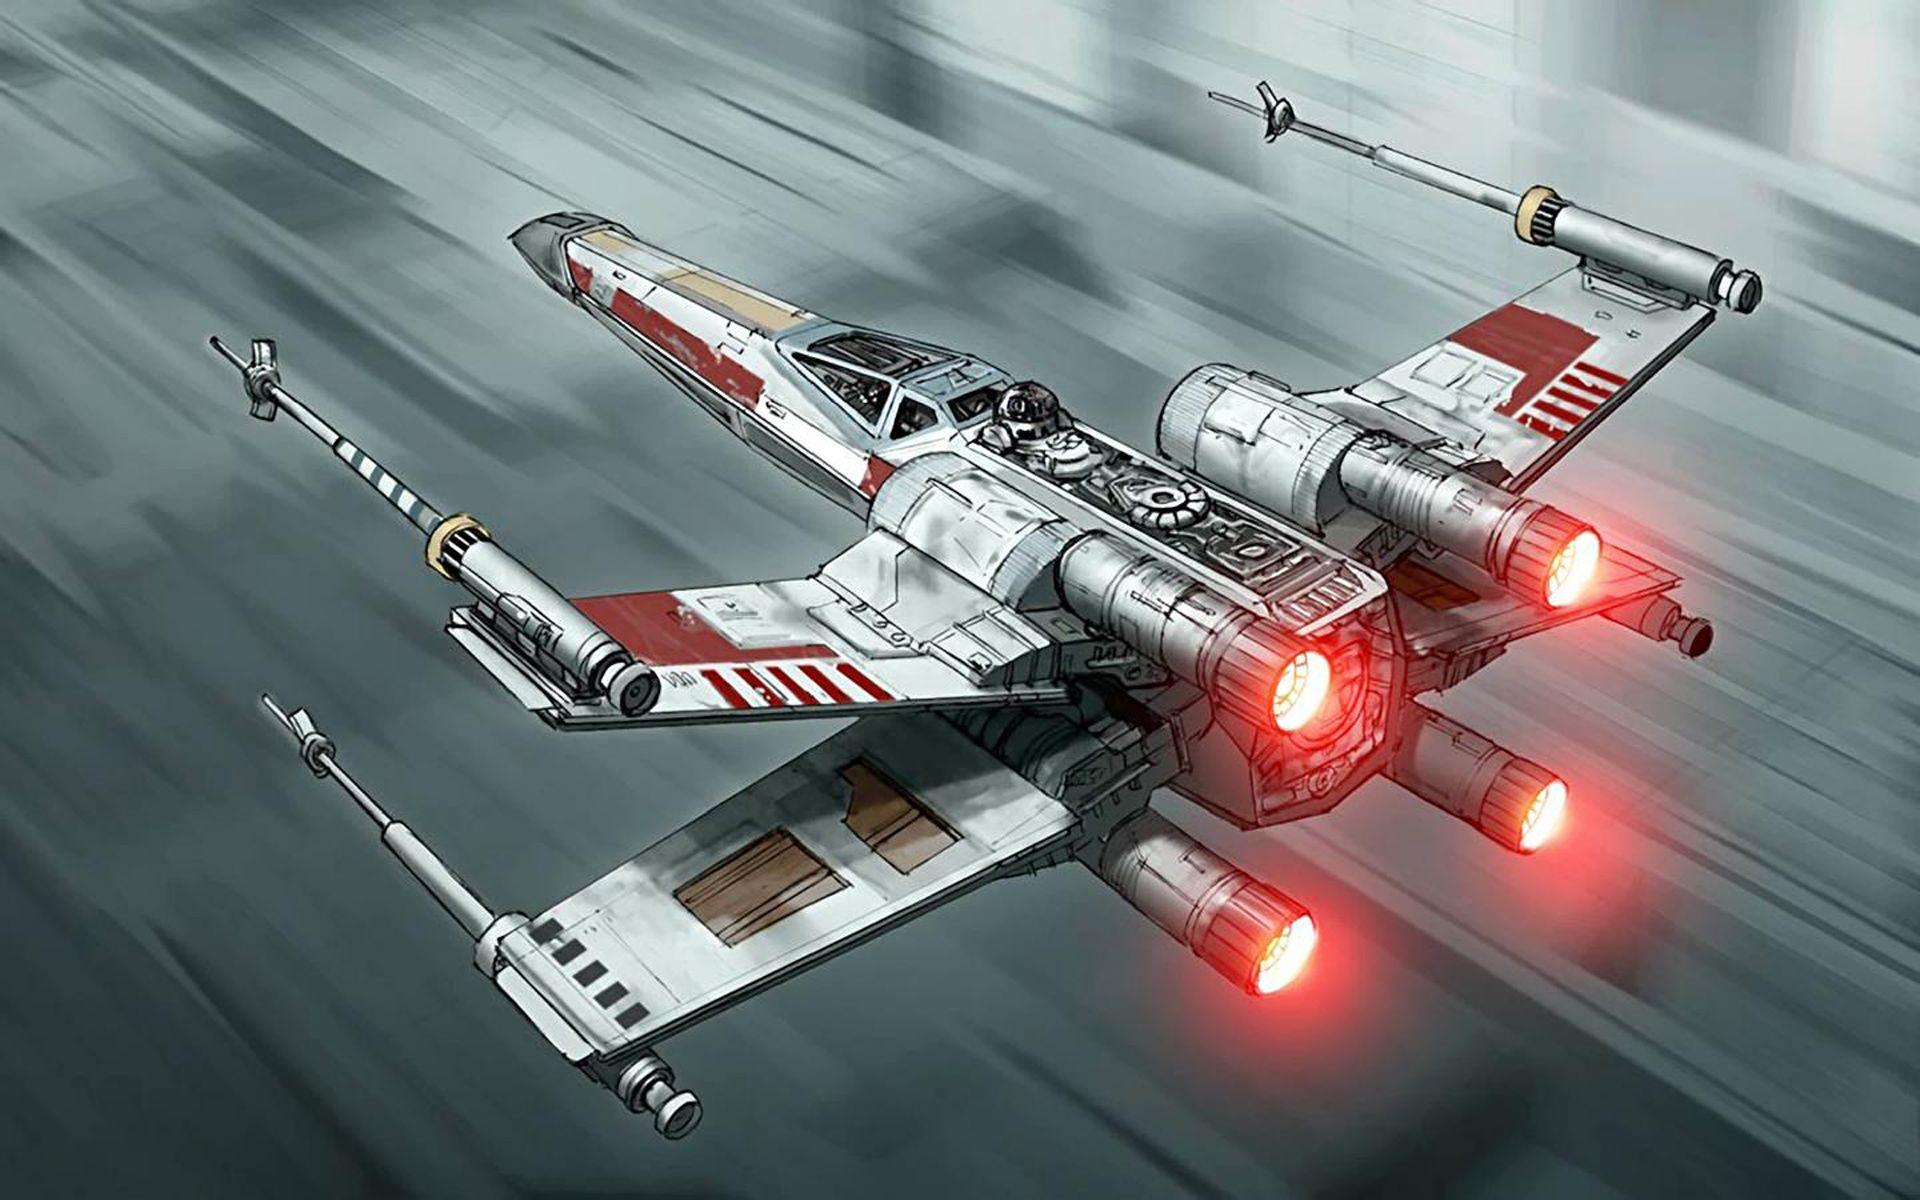 Star Wars Wallpapers Mega Dump Star Wars Wallpaper Star Wars Ships Star Wars Artwork